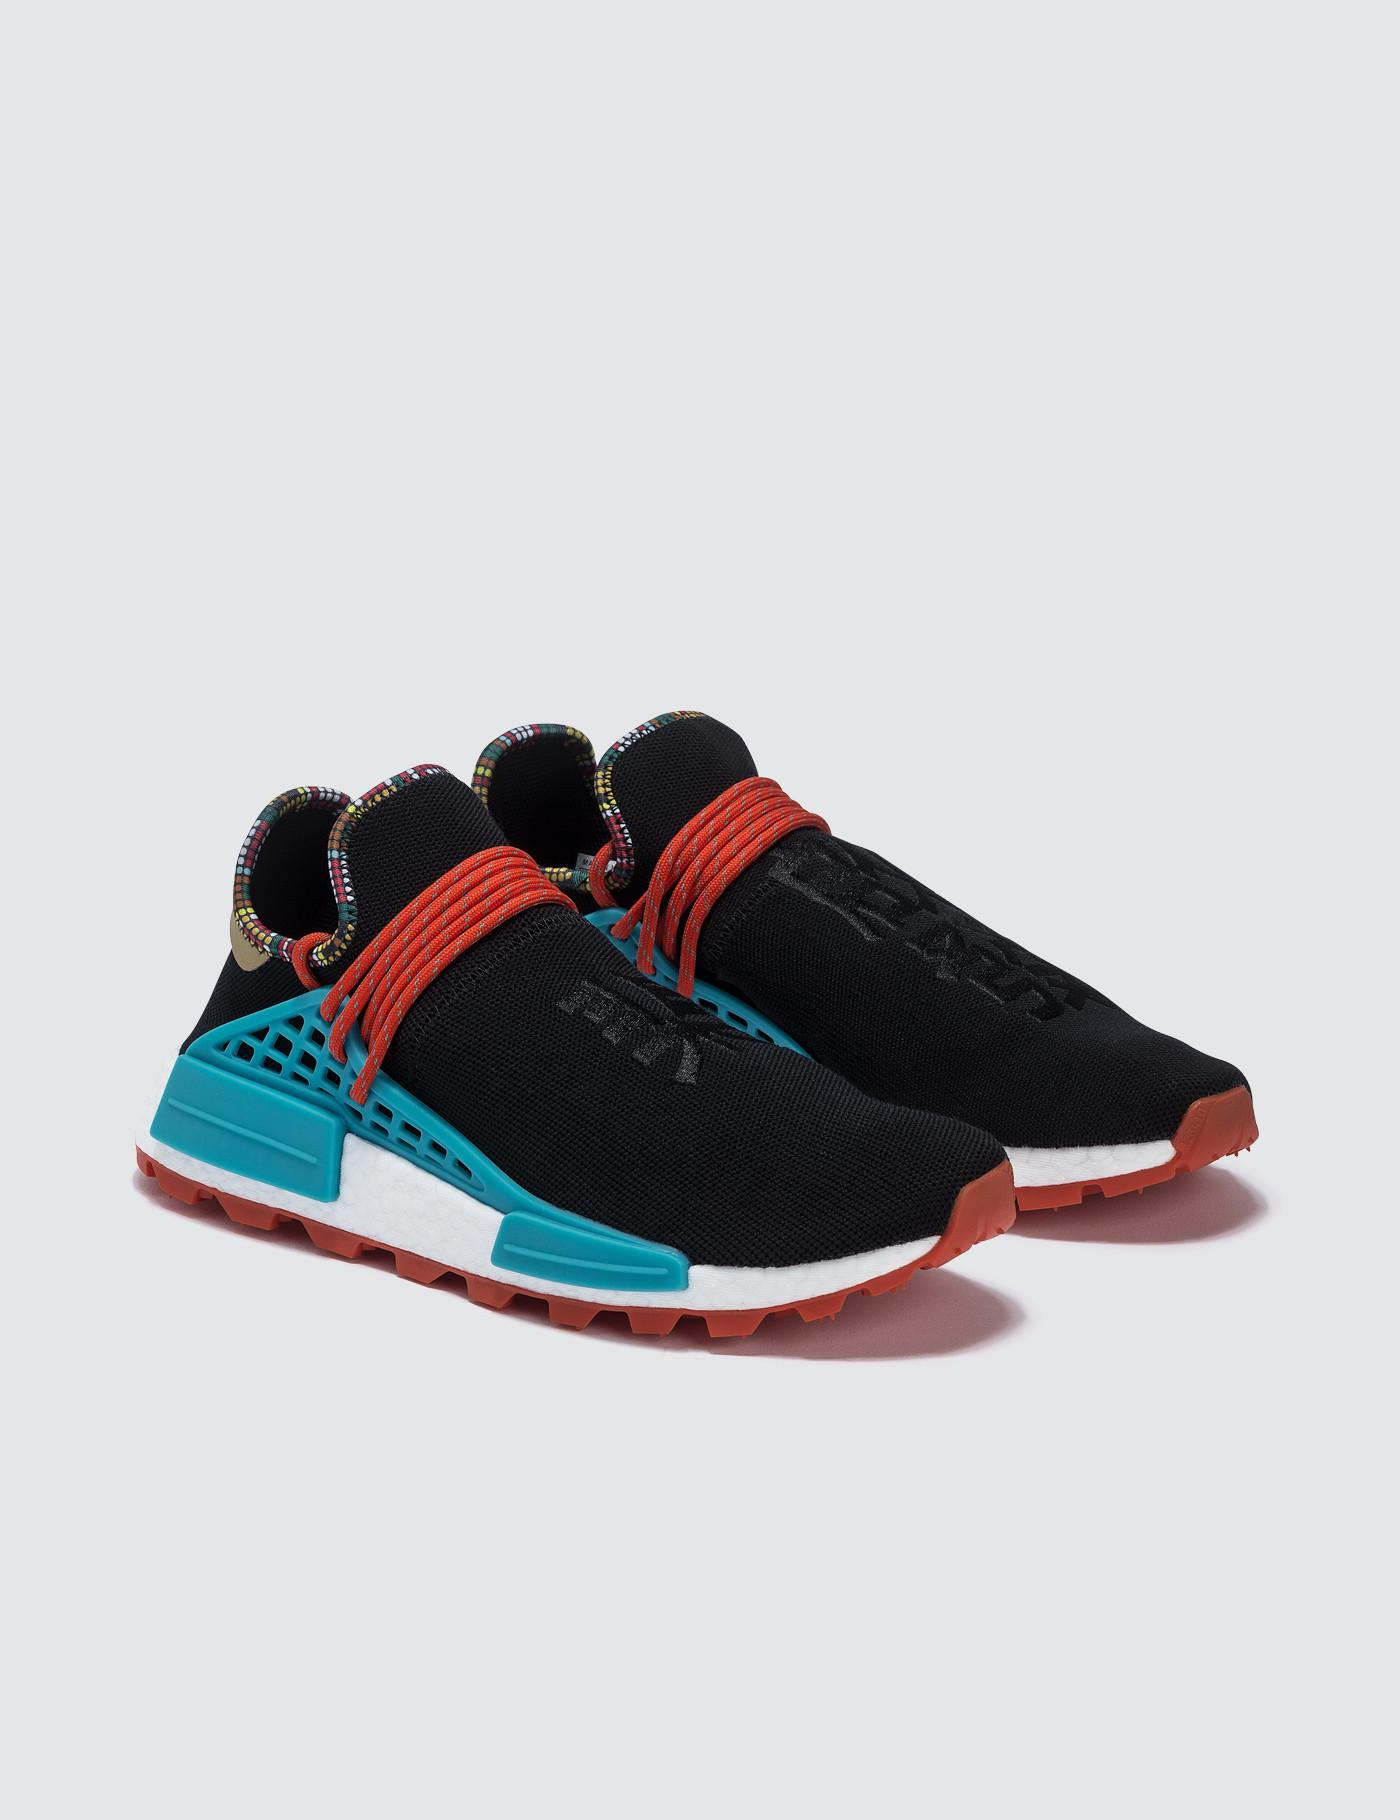 c7b3c67e9 adidas Originals Pharrell Williams X Adidas Pw Solar Hu Nmd in Black ...